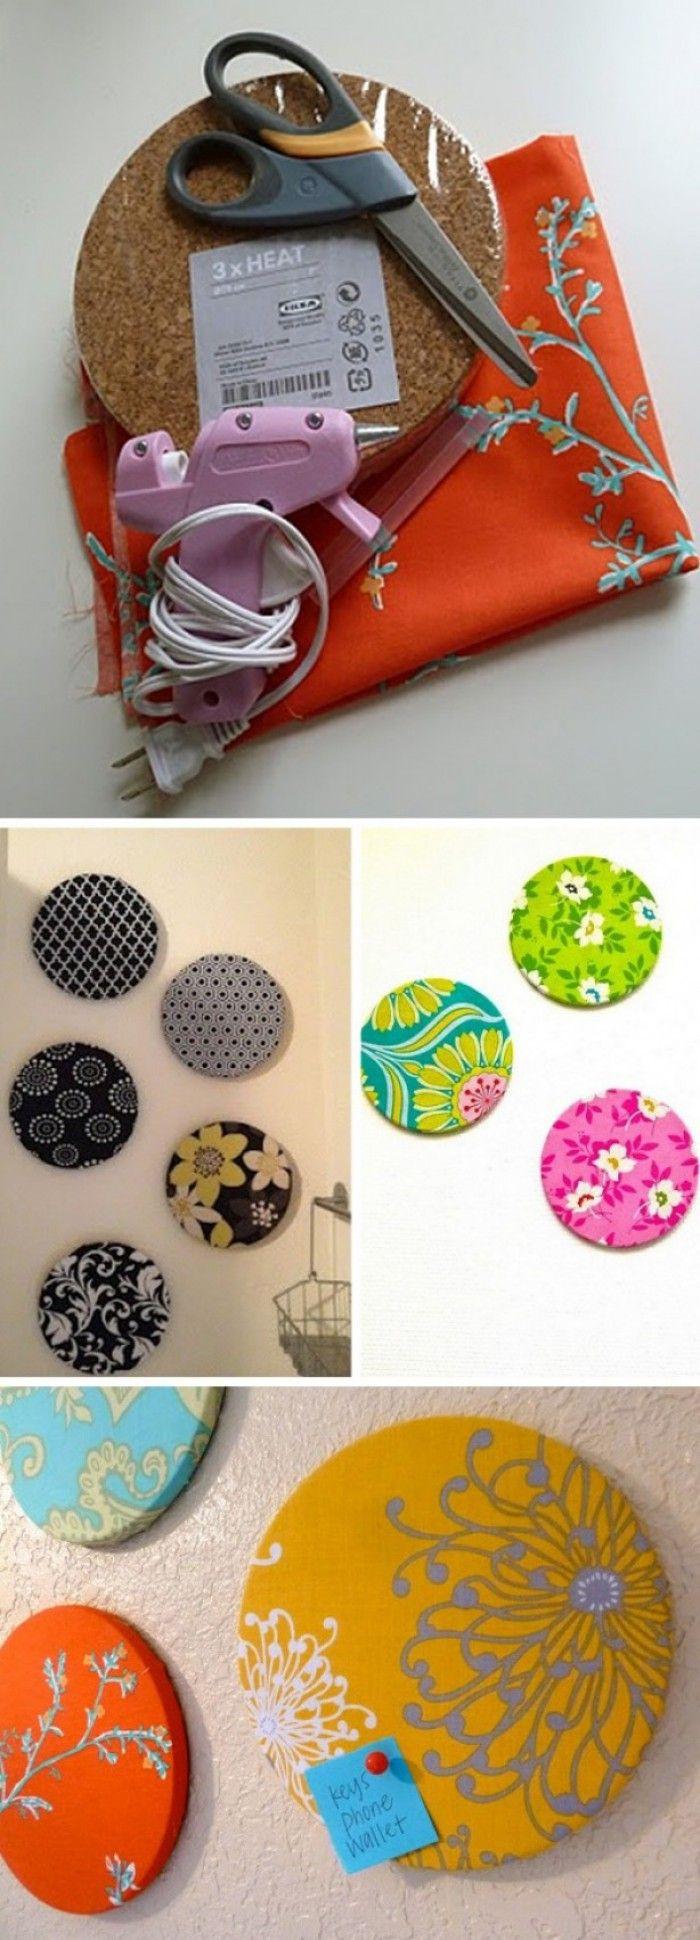 ber ideen zu pinnwand selber machen auf pinterest. Black Bedroom Furniture Sets. Home Design Ideas